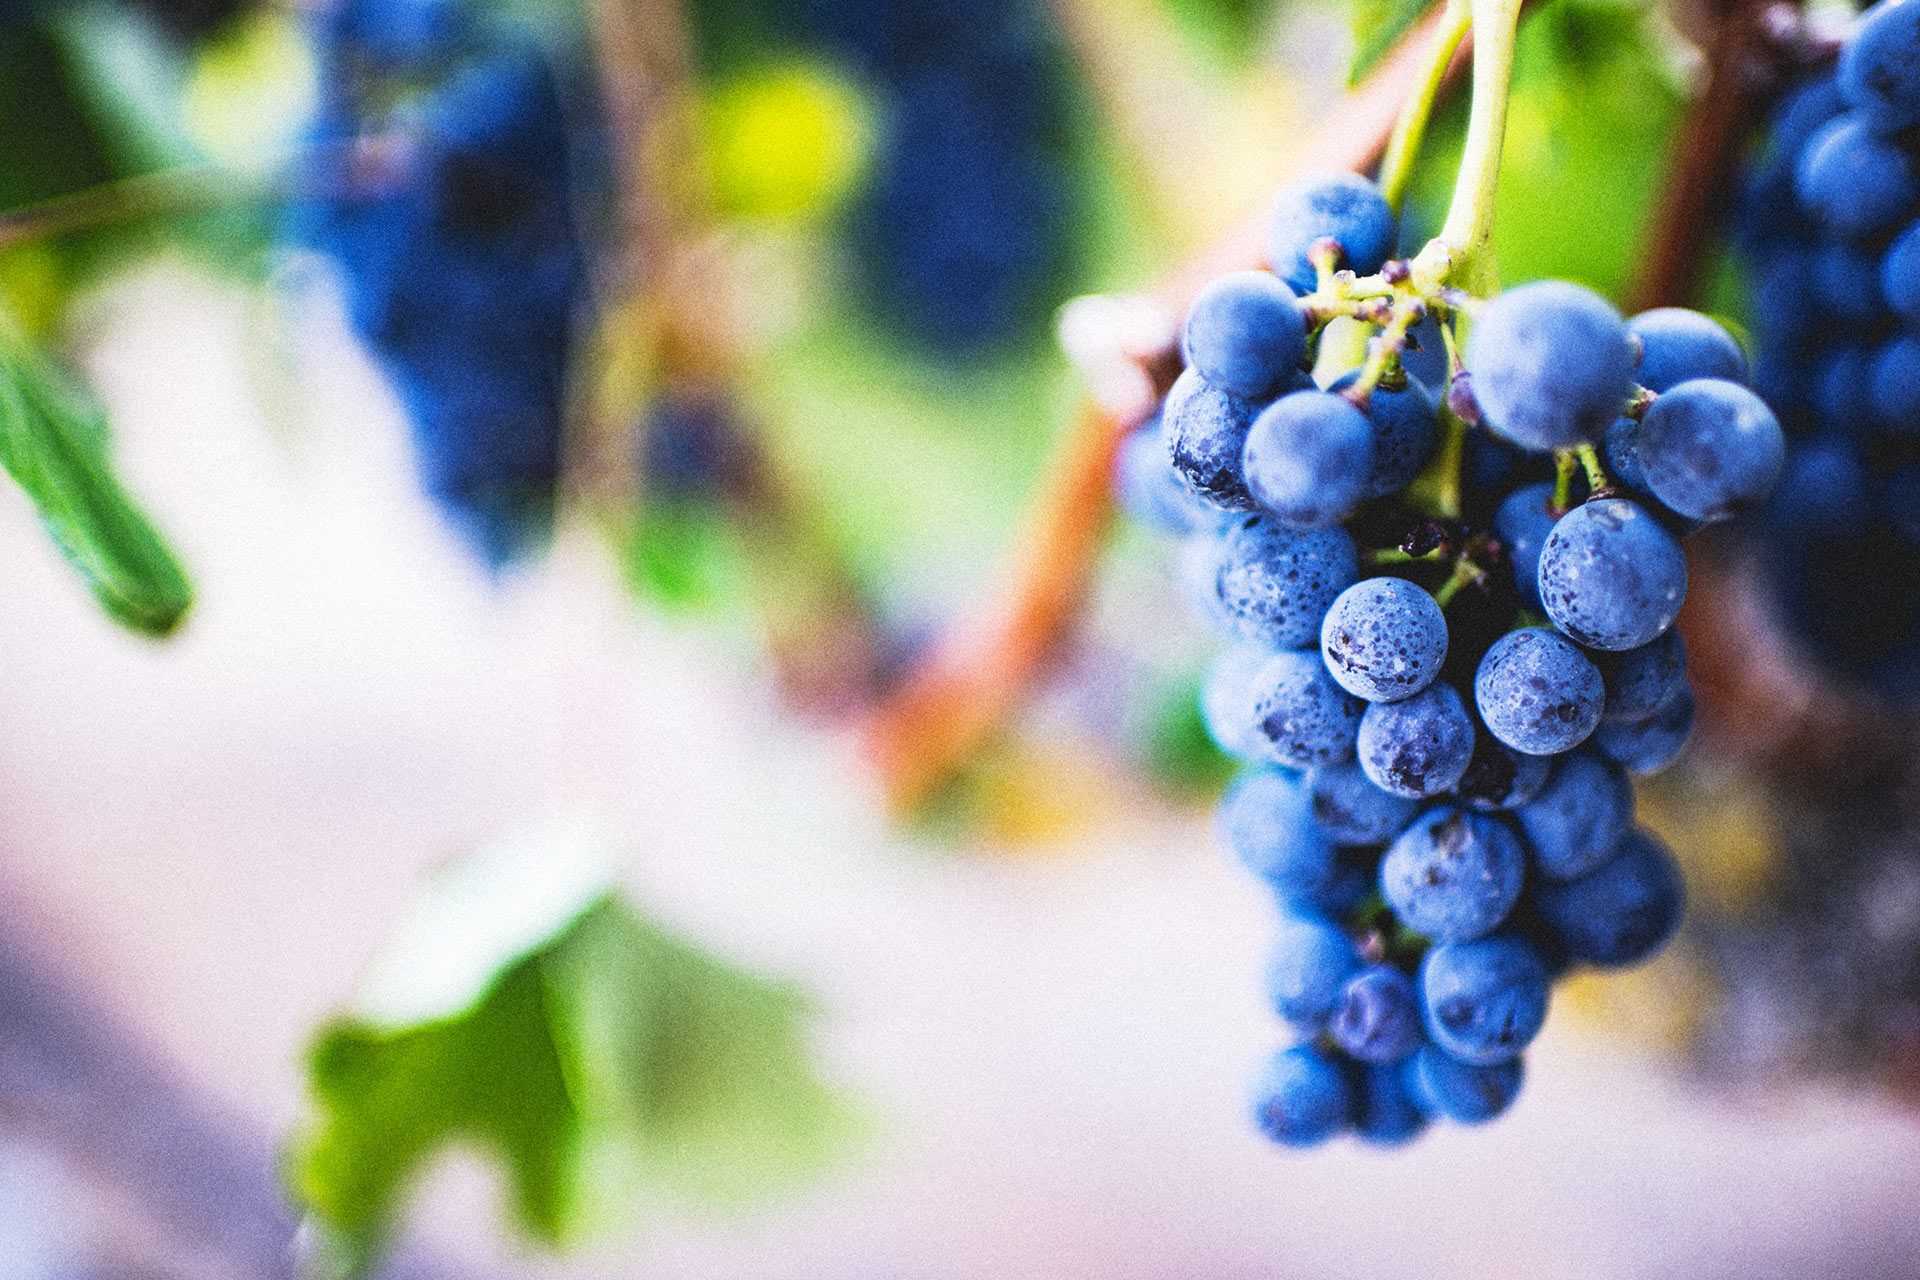 vini-todi - todi- wine- wines of Todi - umbrian wines